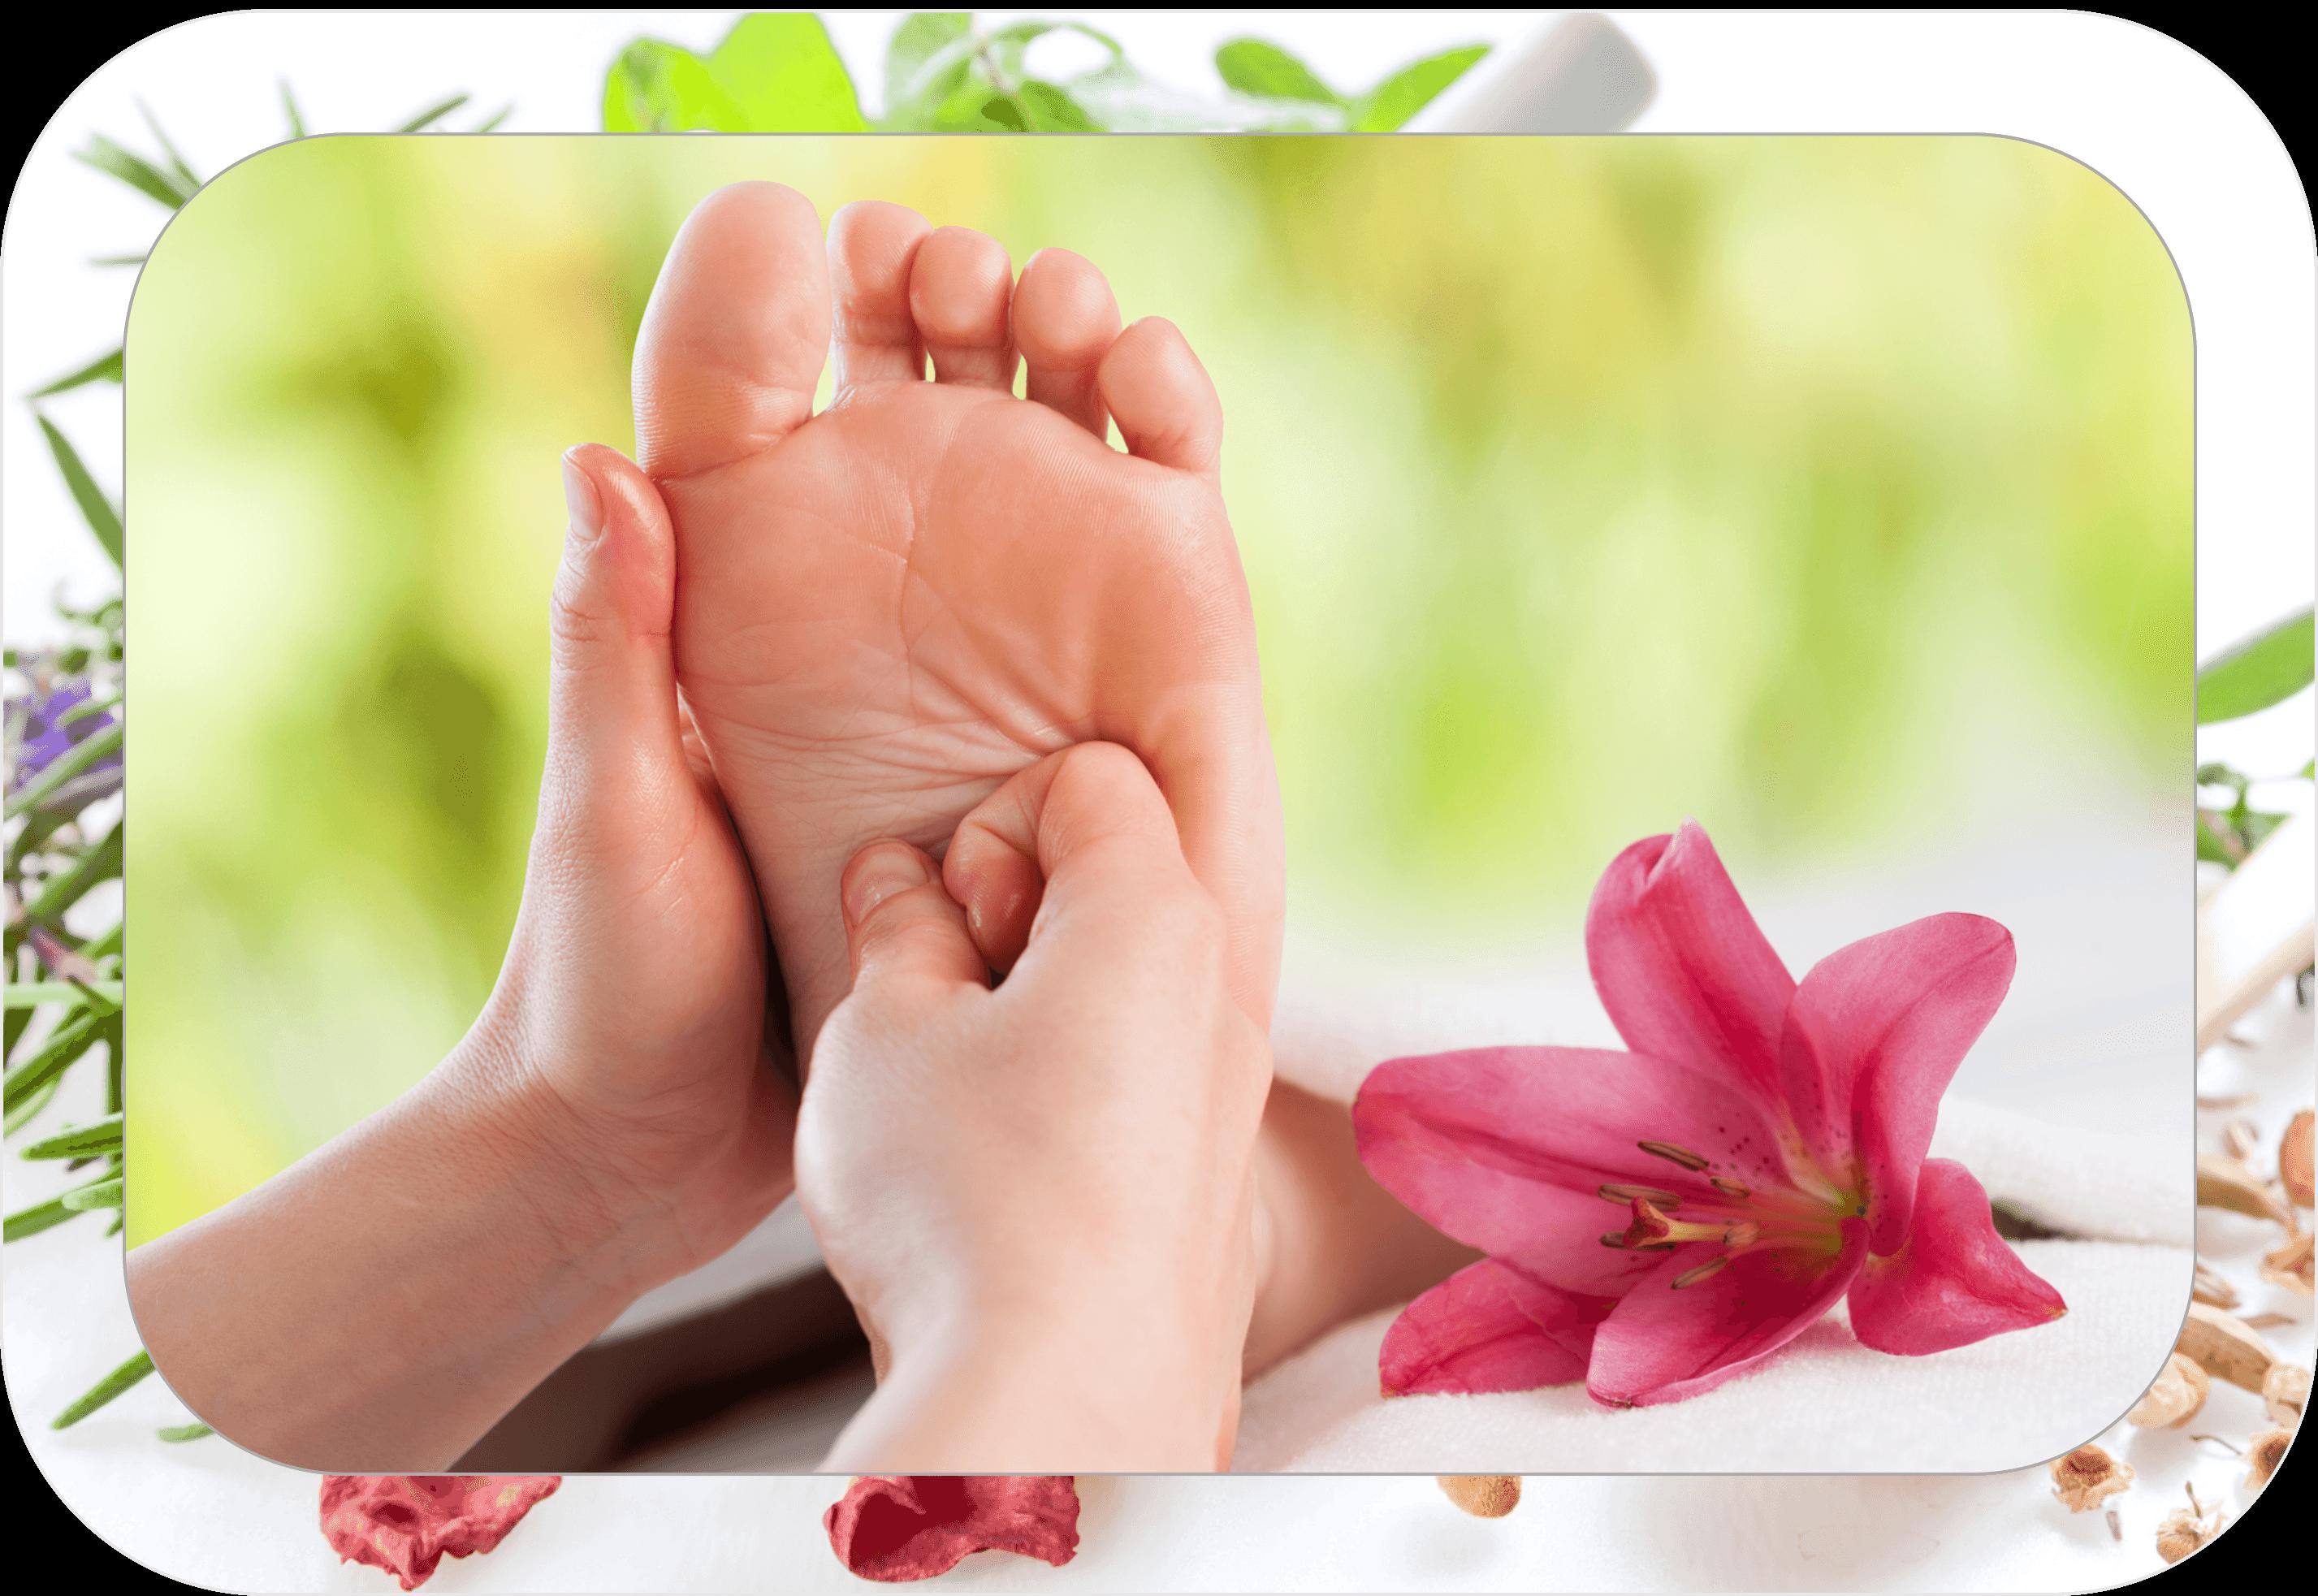 Massage nail salon. Foot clipart clean foot